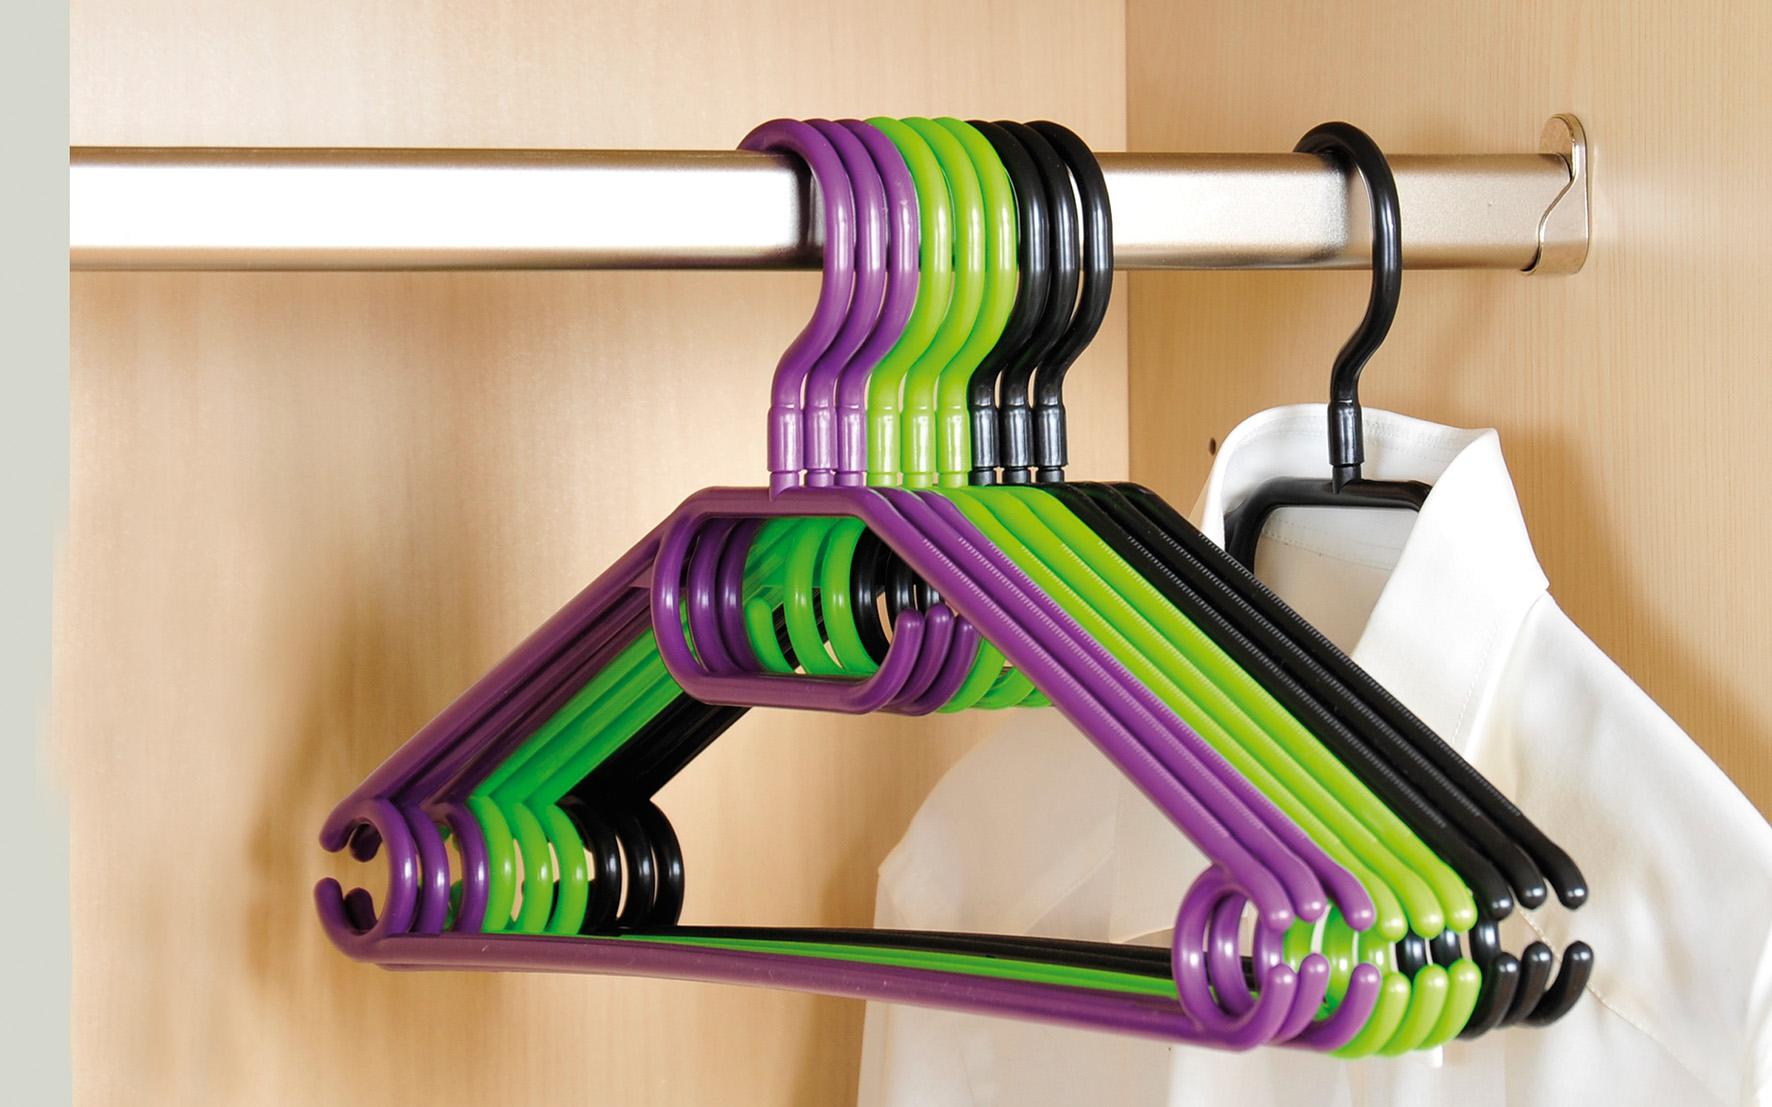 haushalt krausse 10 st ck kleiderb gel kunststoff online kaufen. Black Bedroom Furniture Sets. Home Design Ideas